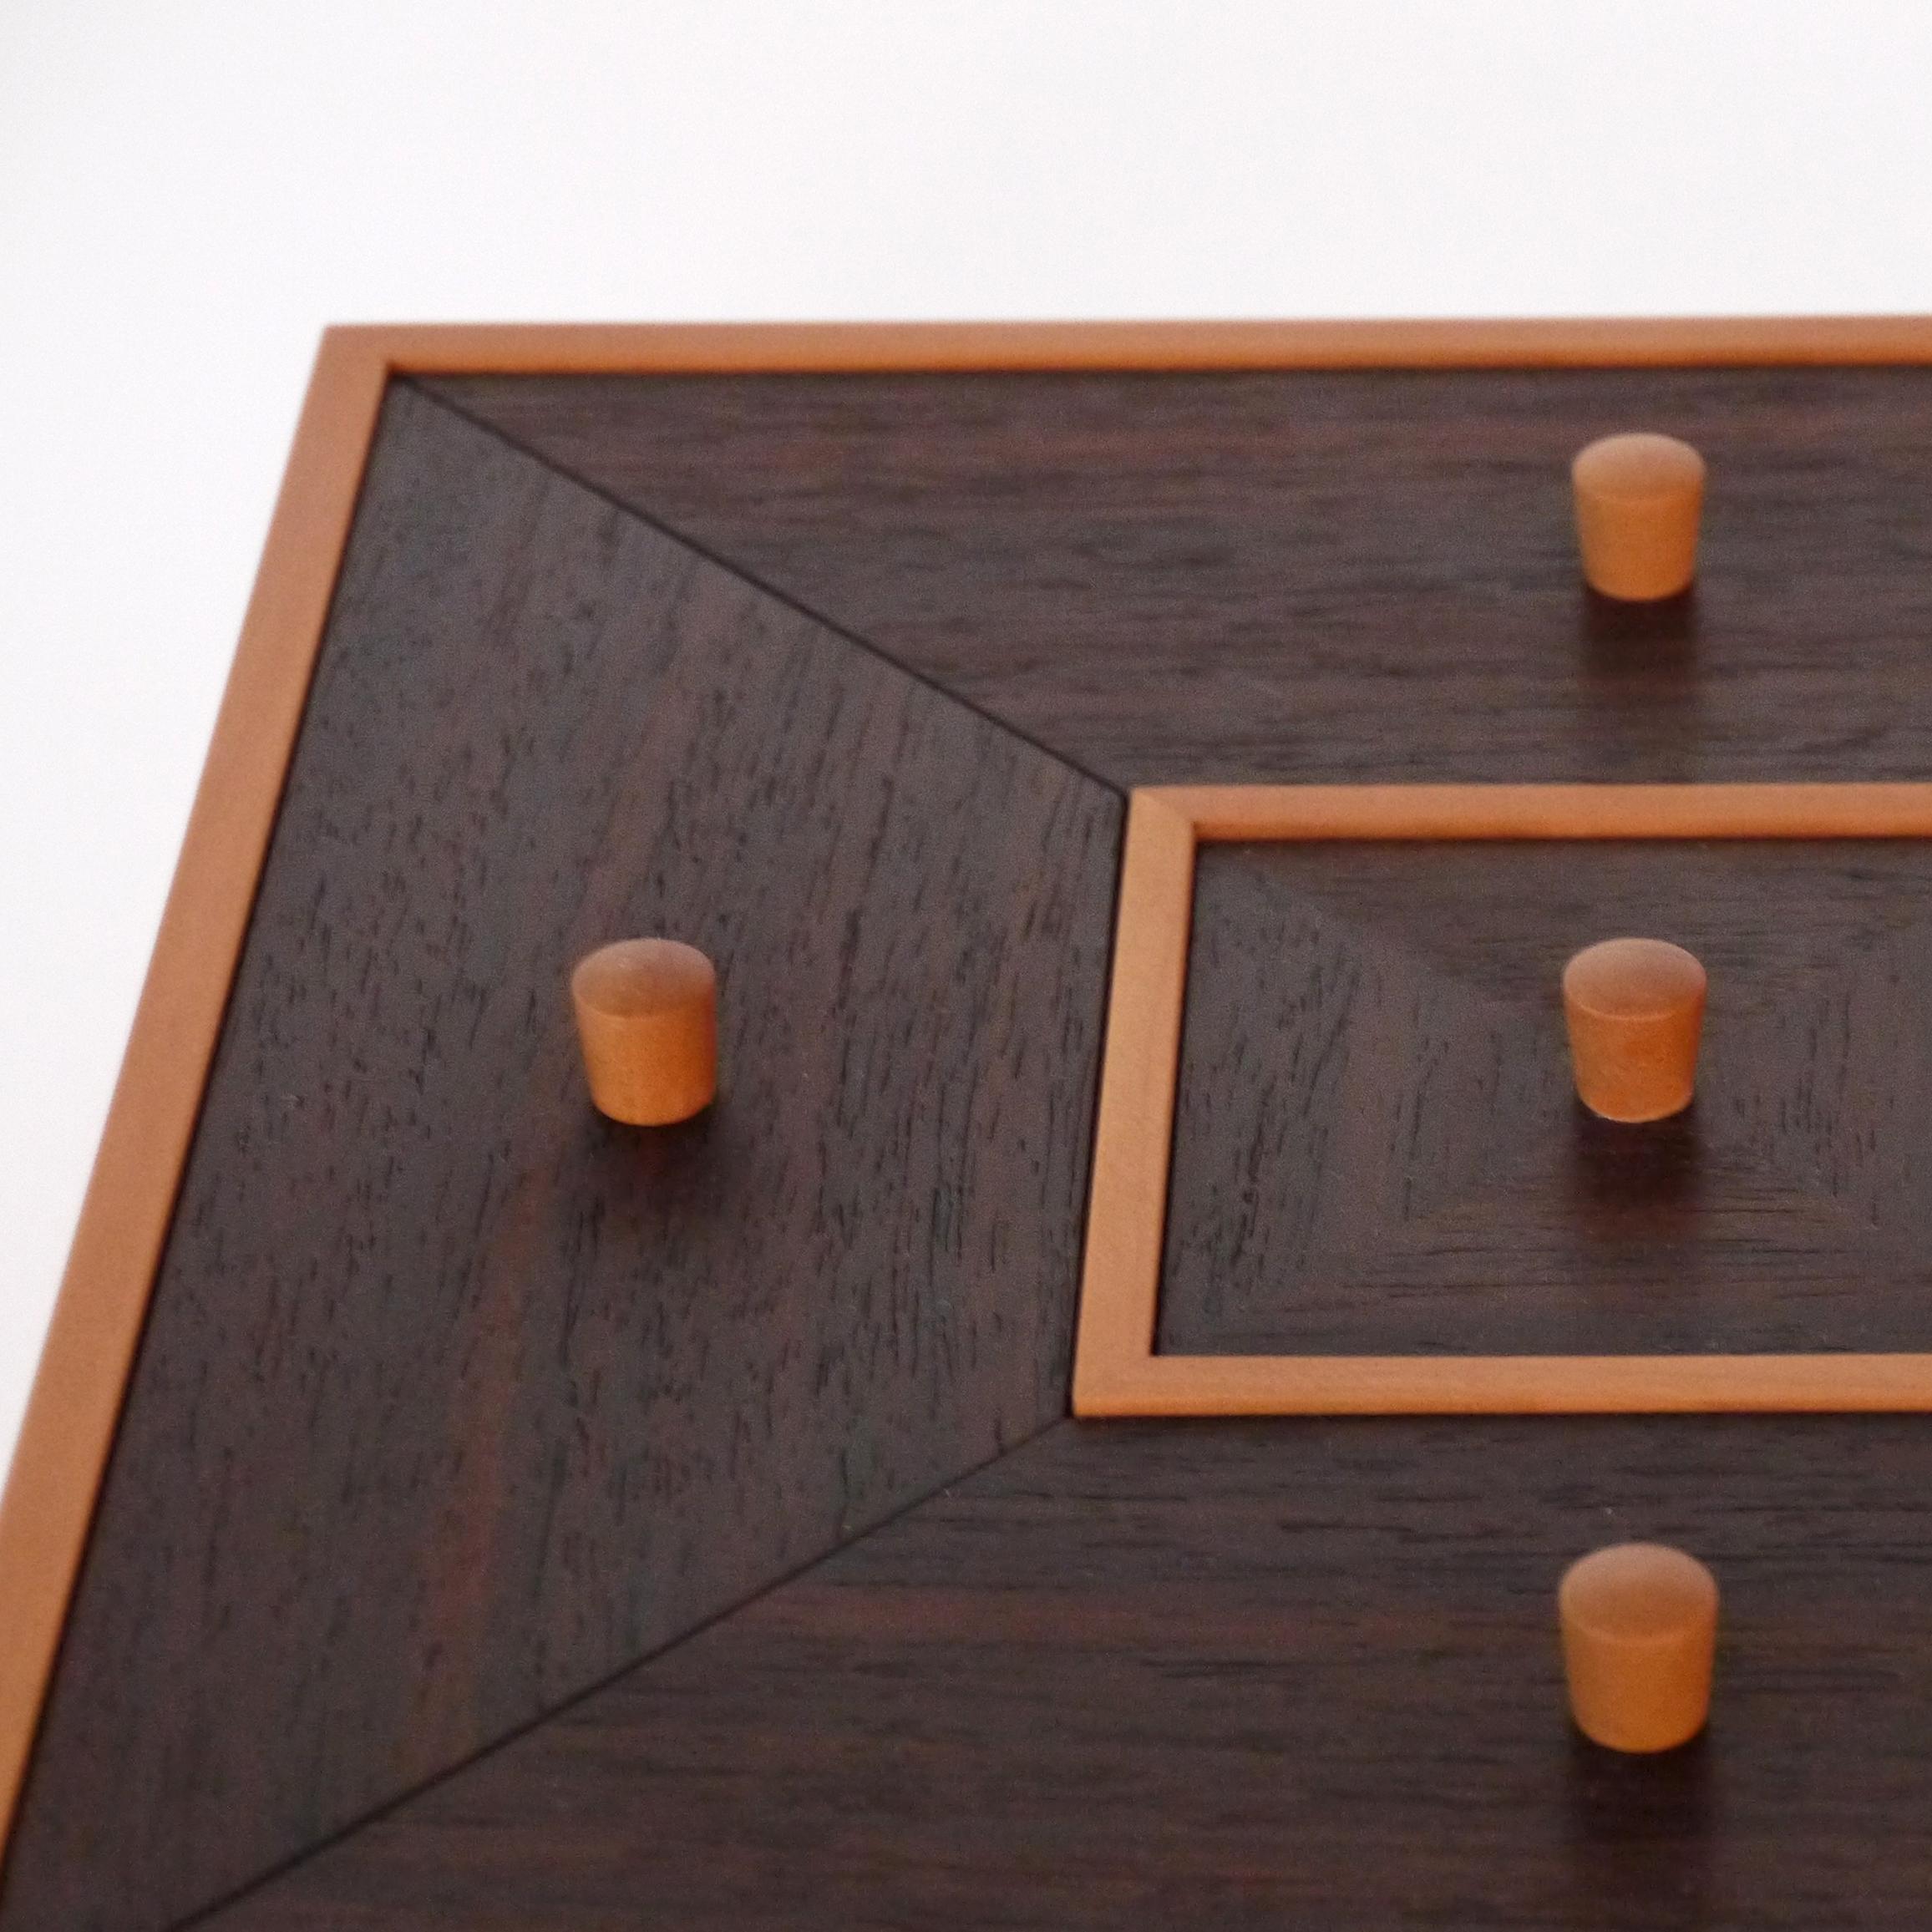 Commission - Award box